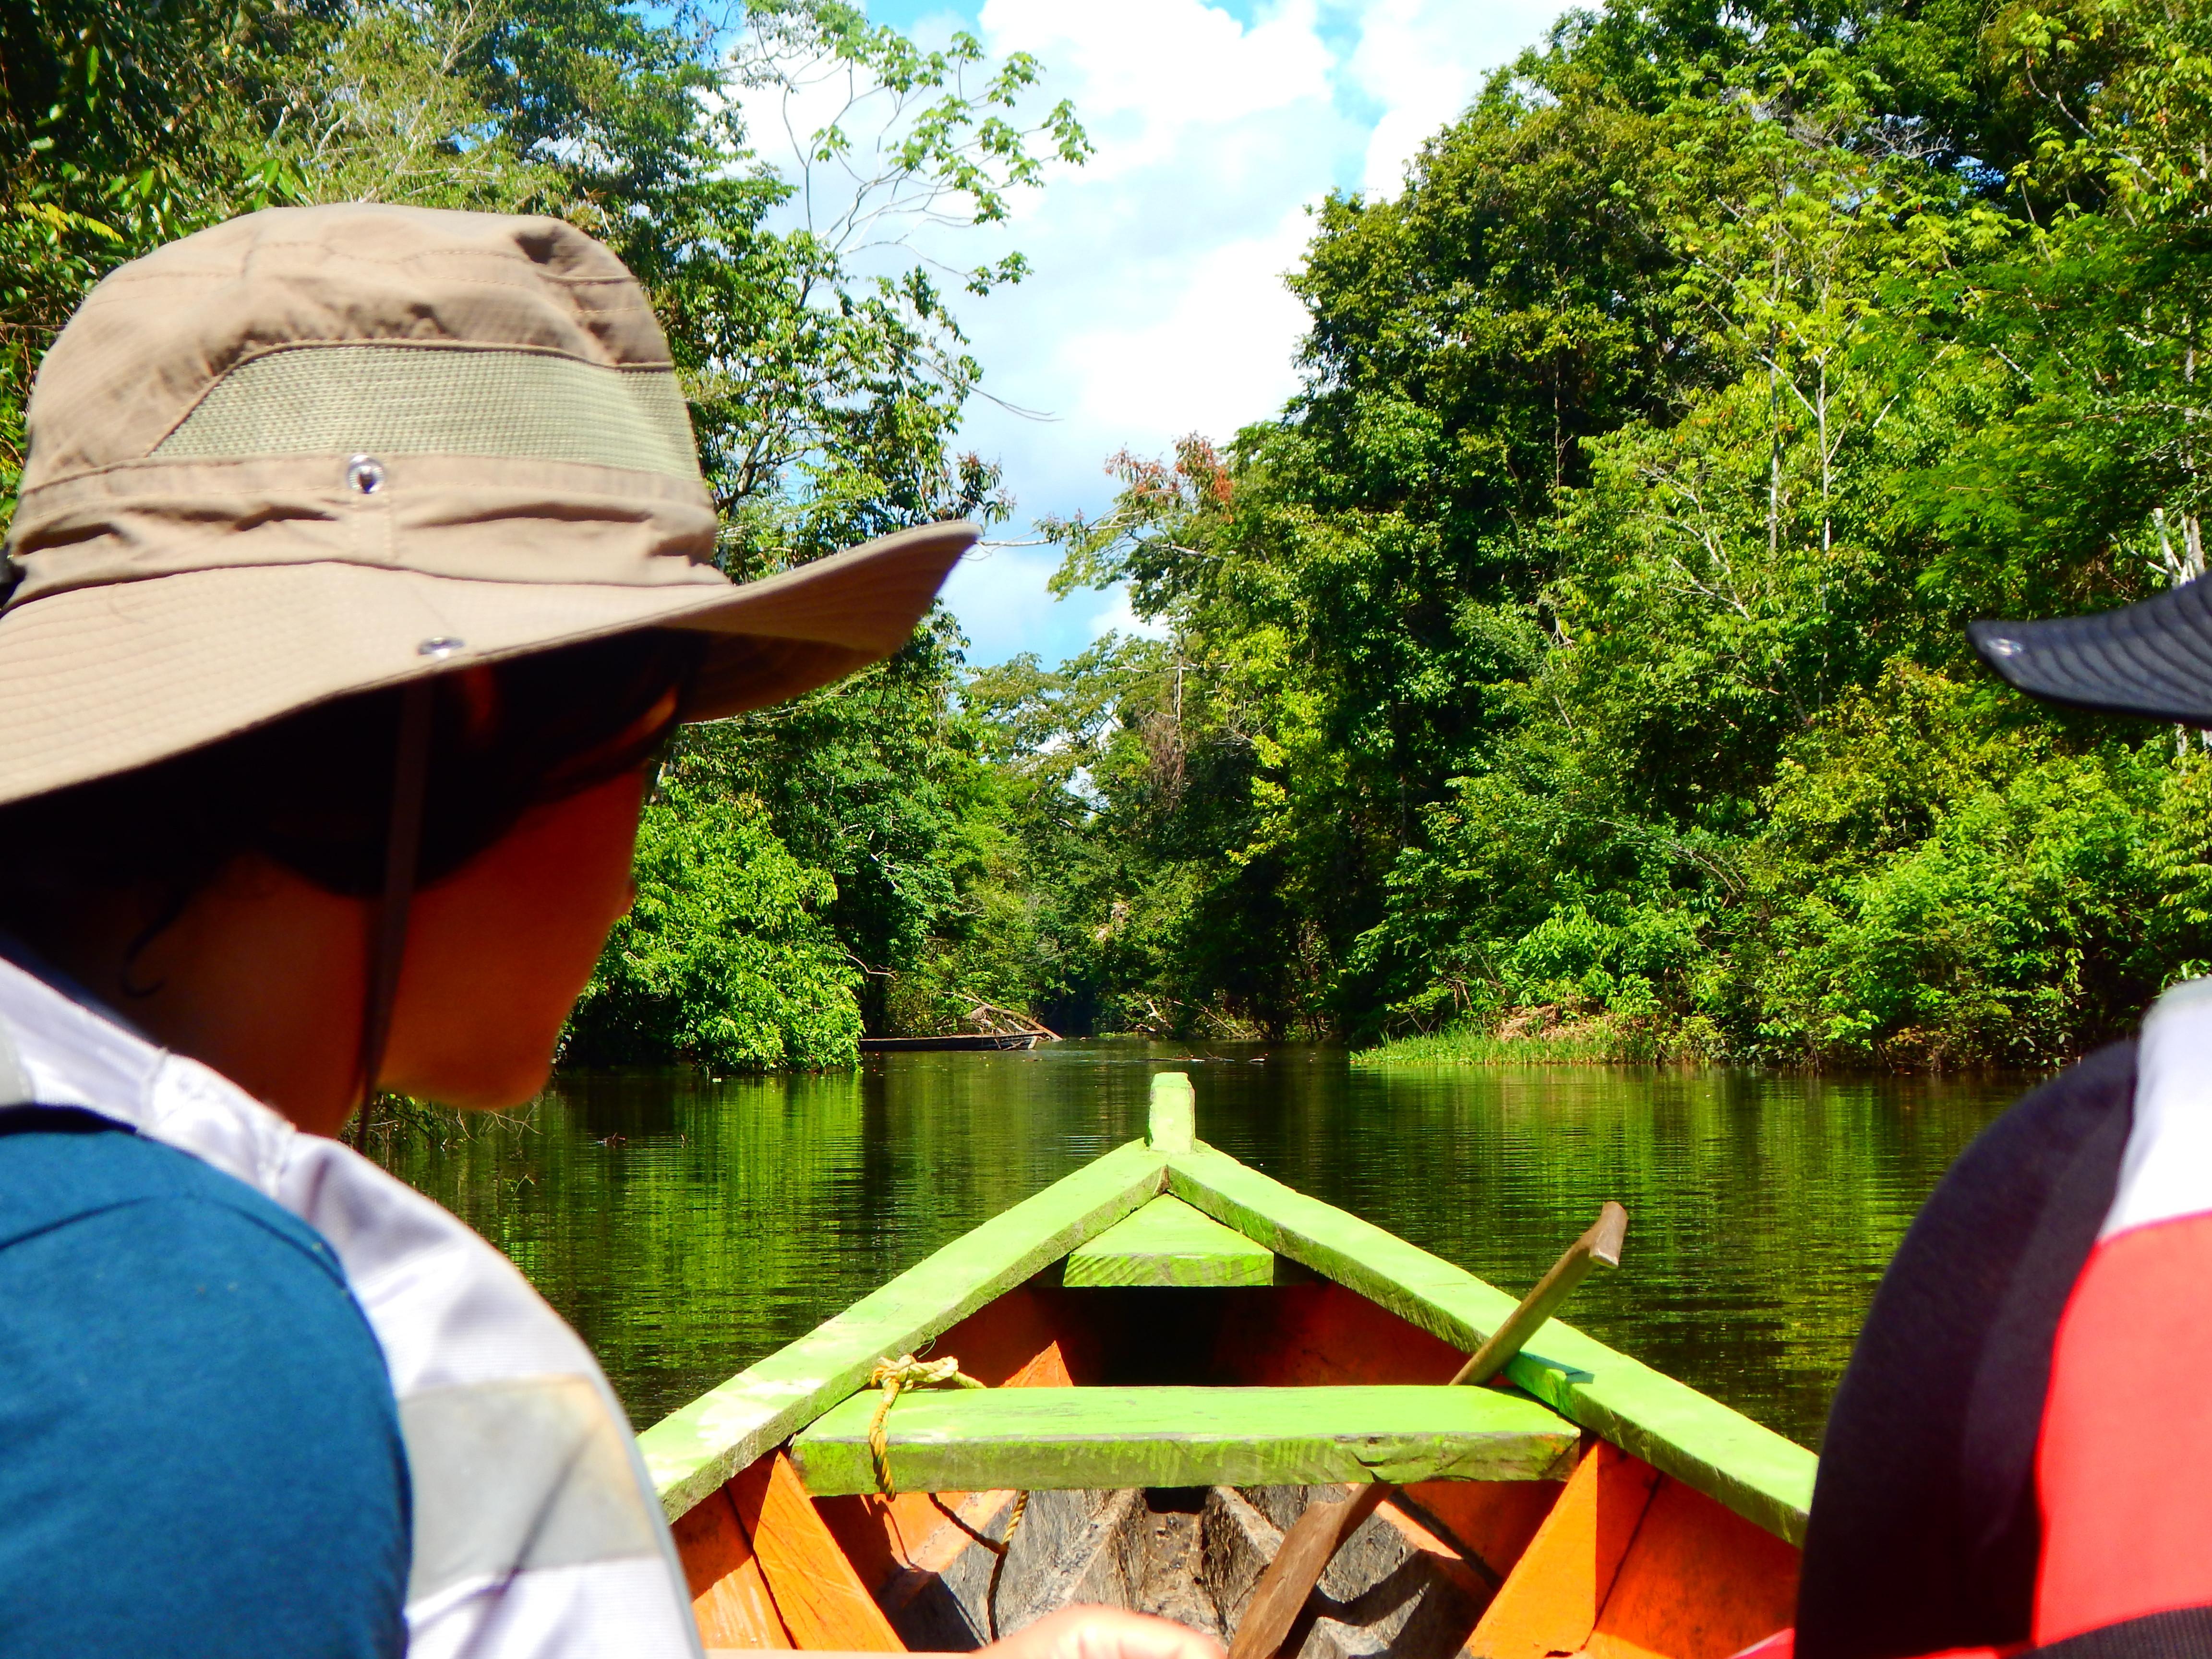 Amazon Jungles & Rivers of Adventure